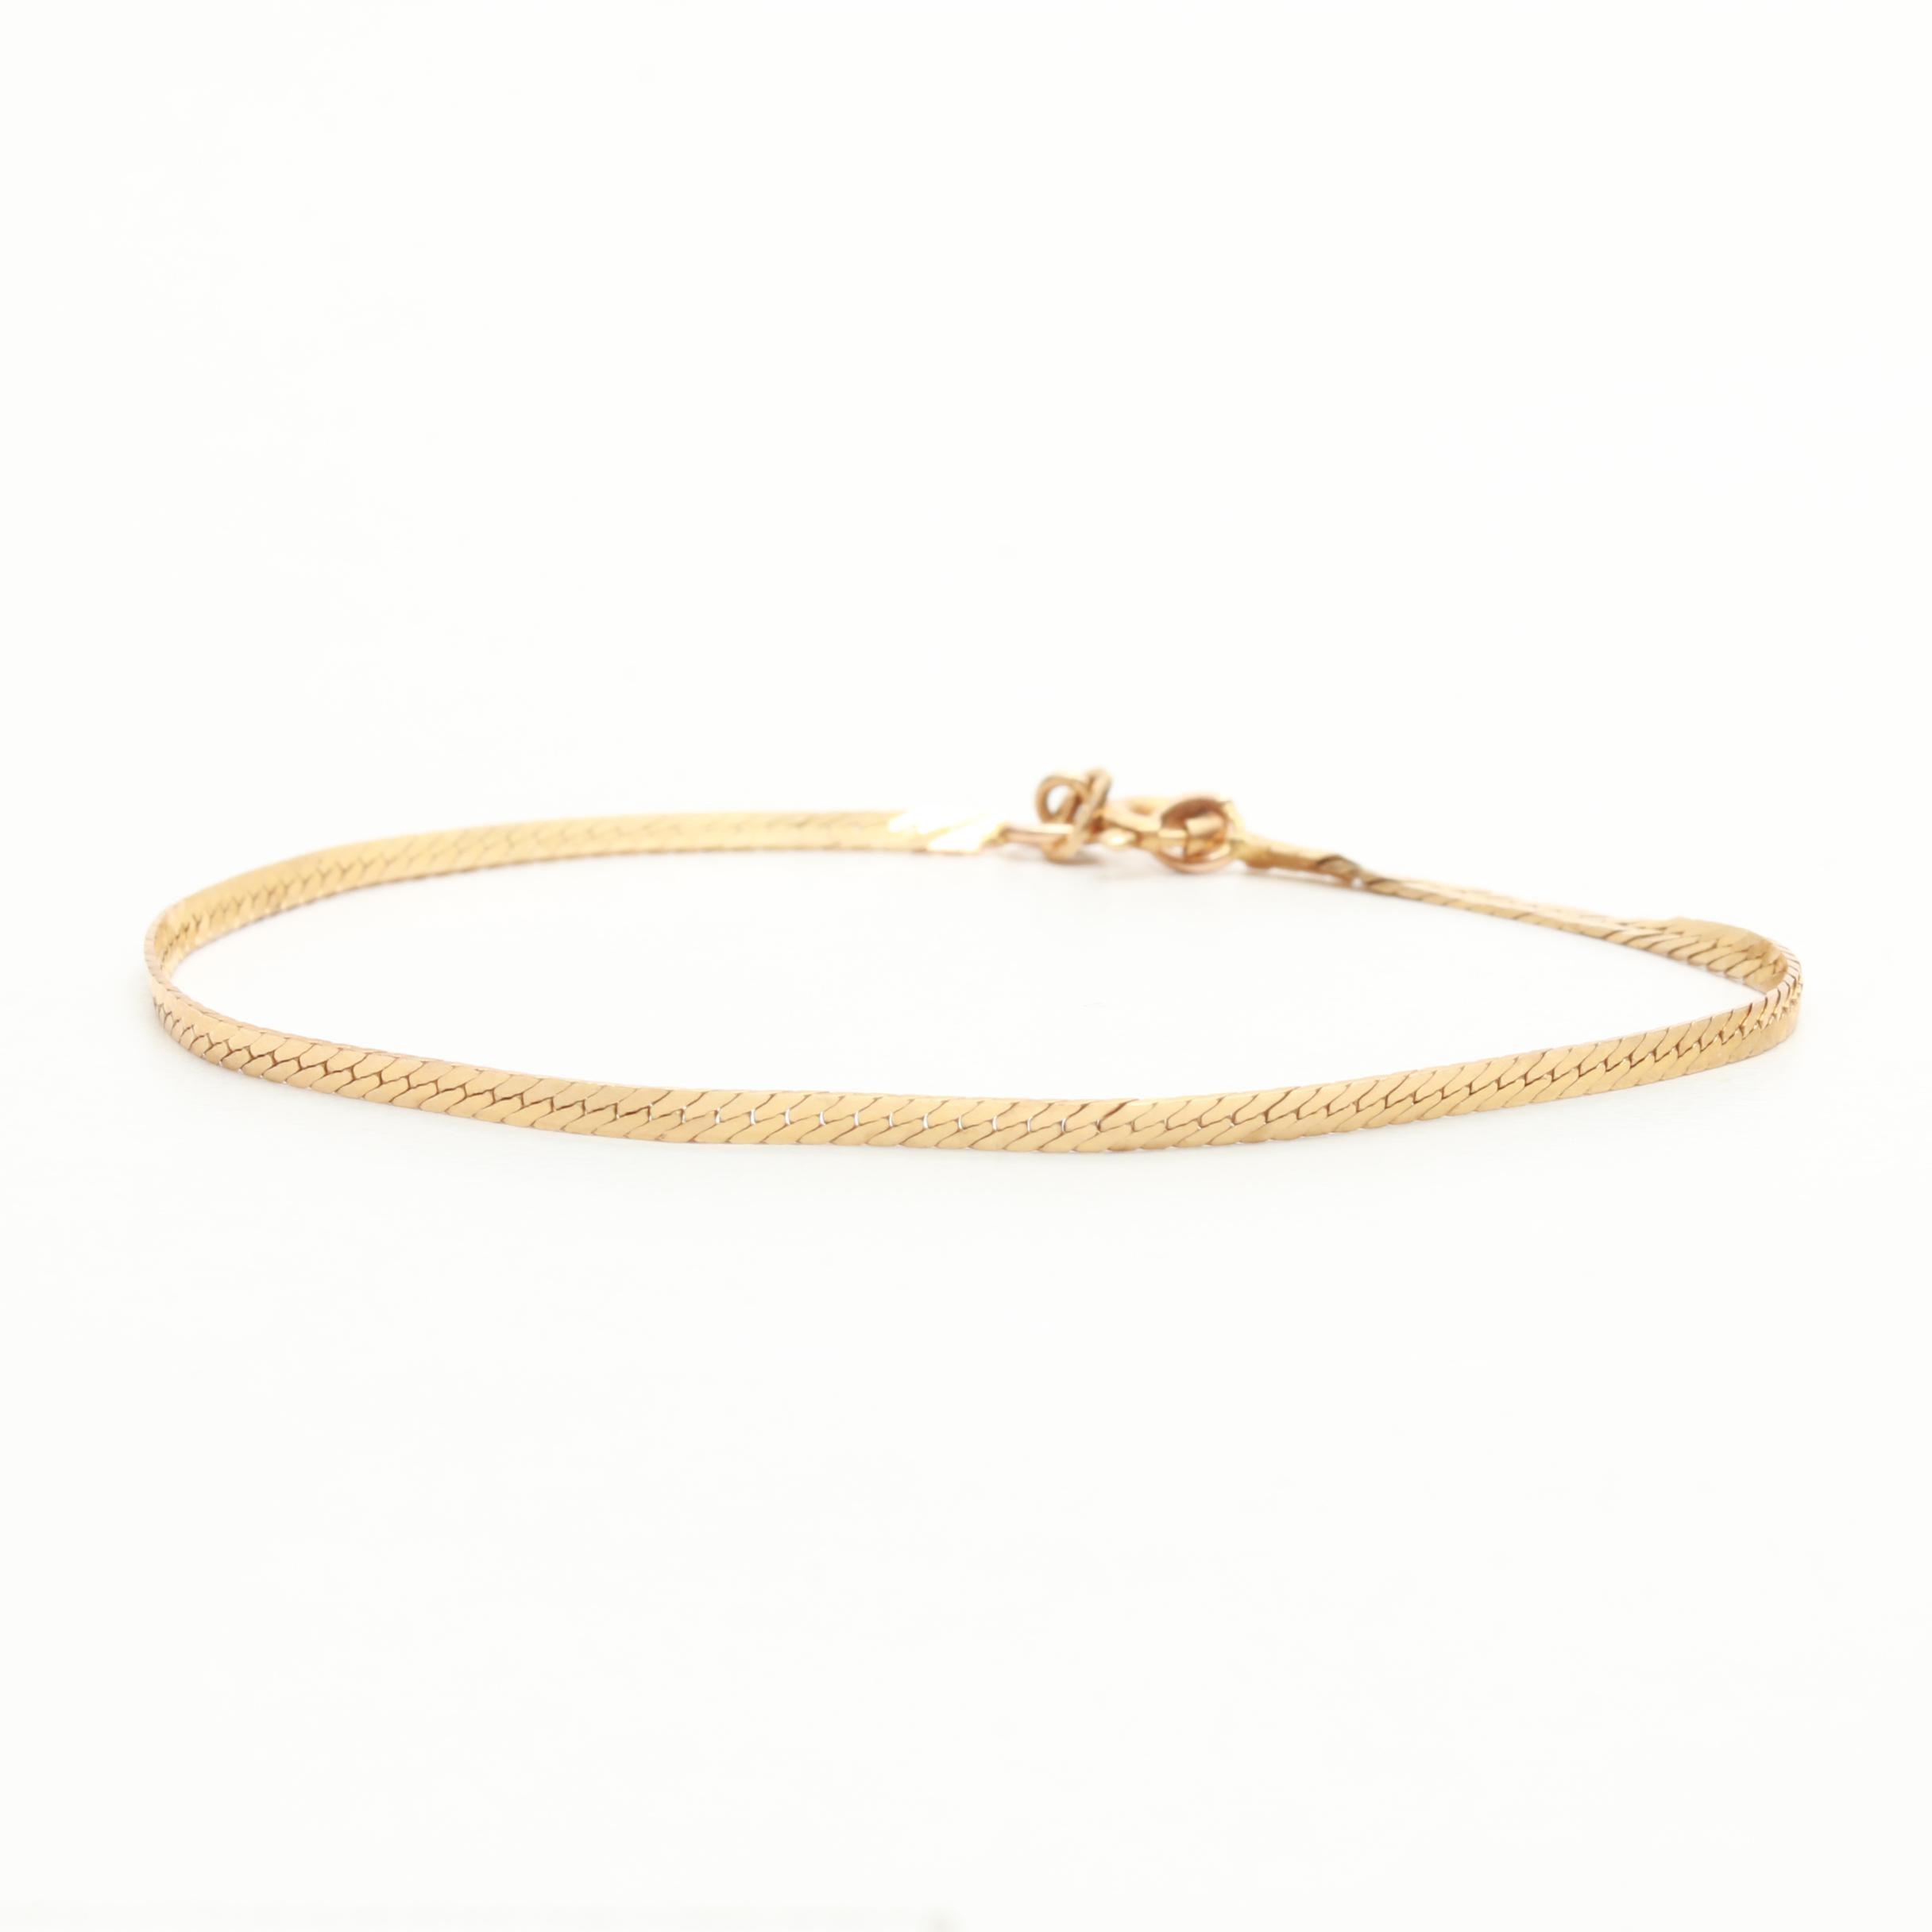 14K Yellow Gold Herringbone Chain Bracelet